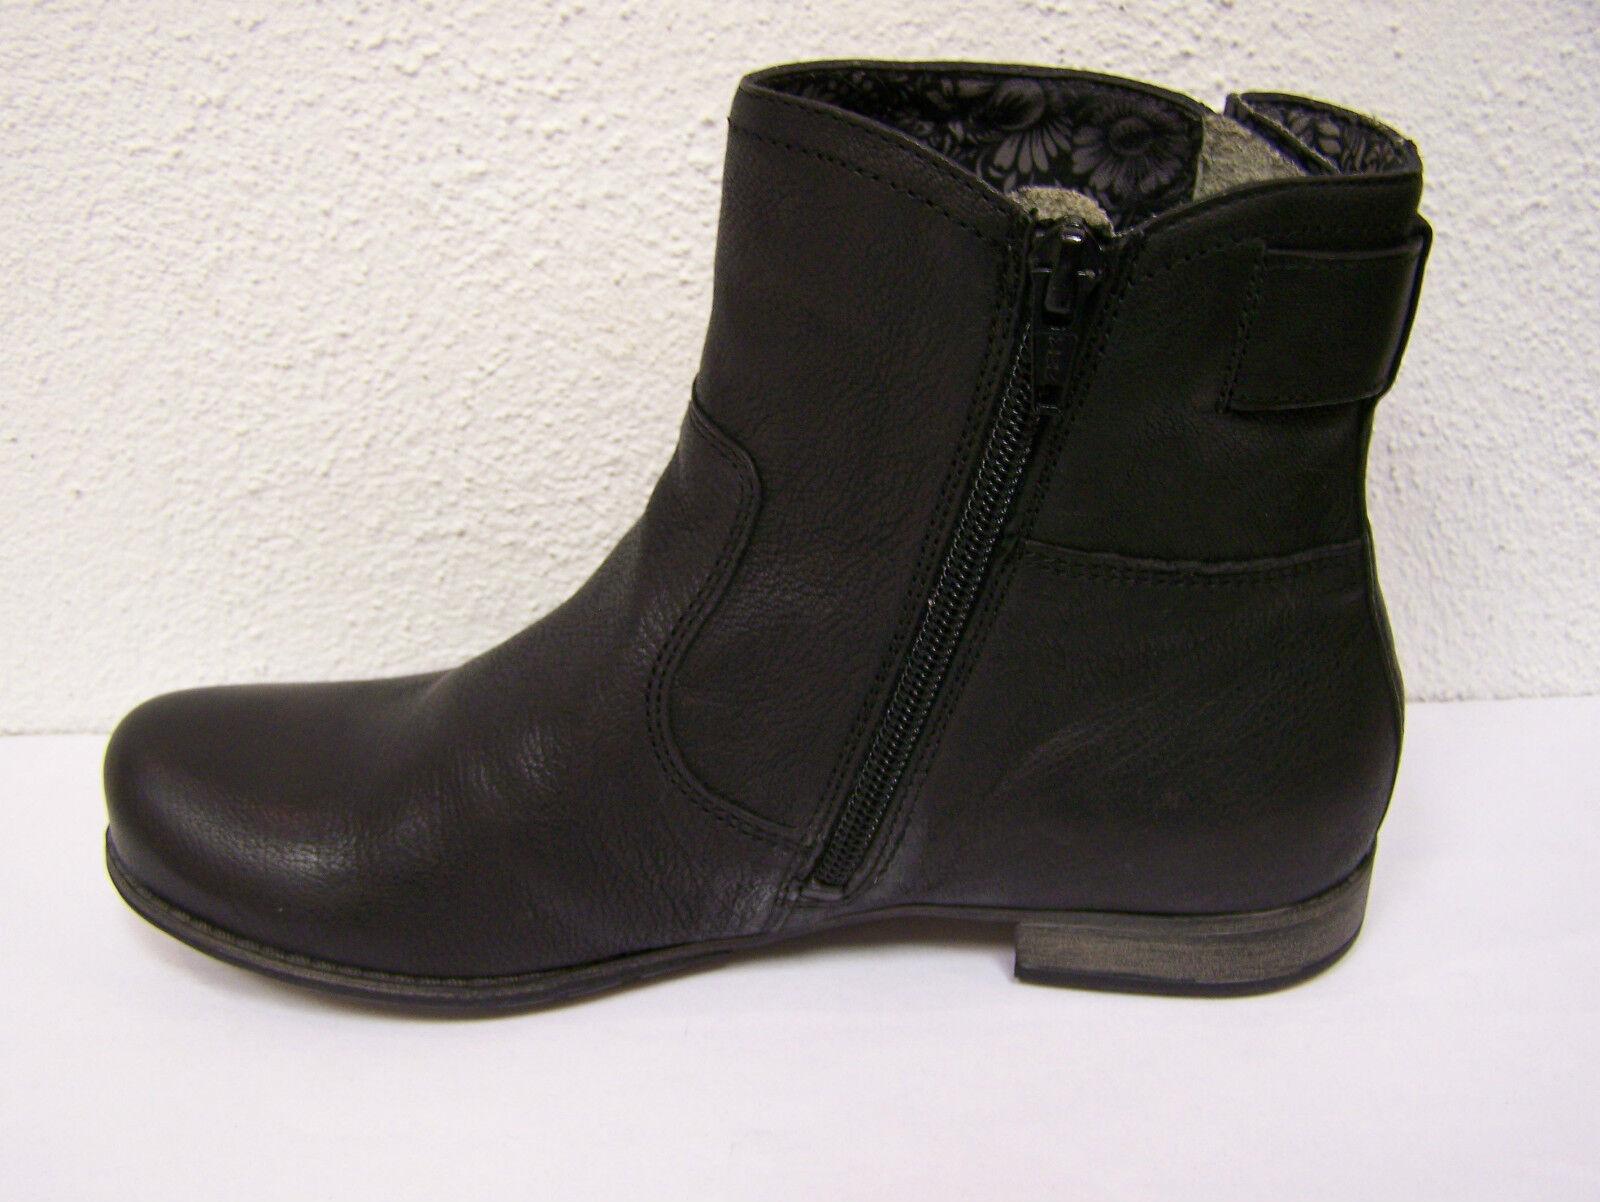 Think  Stiefel Stiefel Stiefel Modell Denk Stiefel schwarz / kombi effekt incl. THINK Tüte 4f6e05